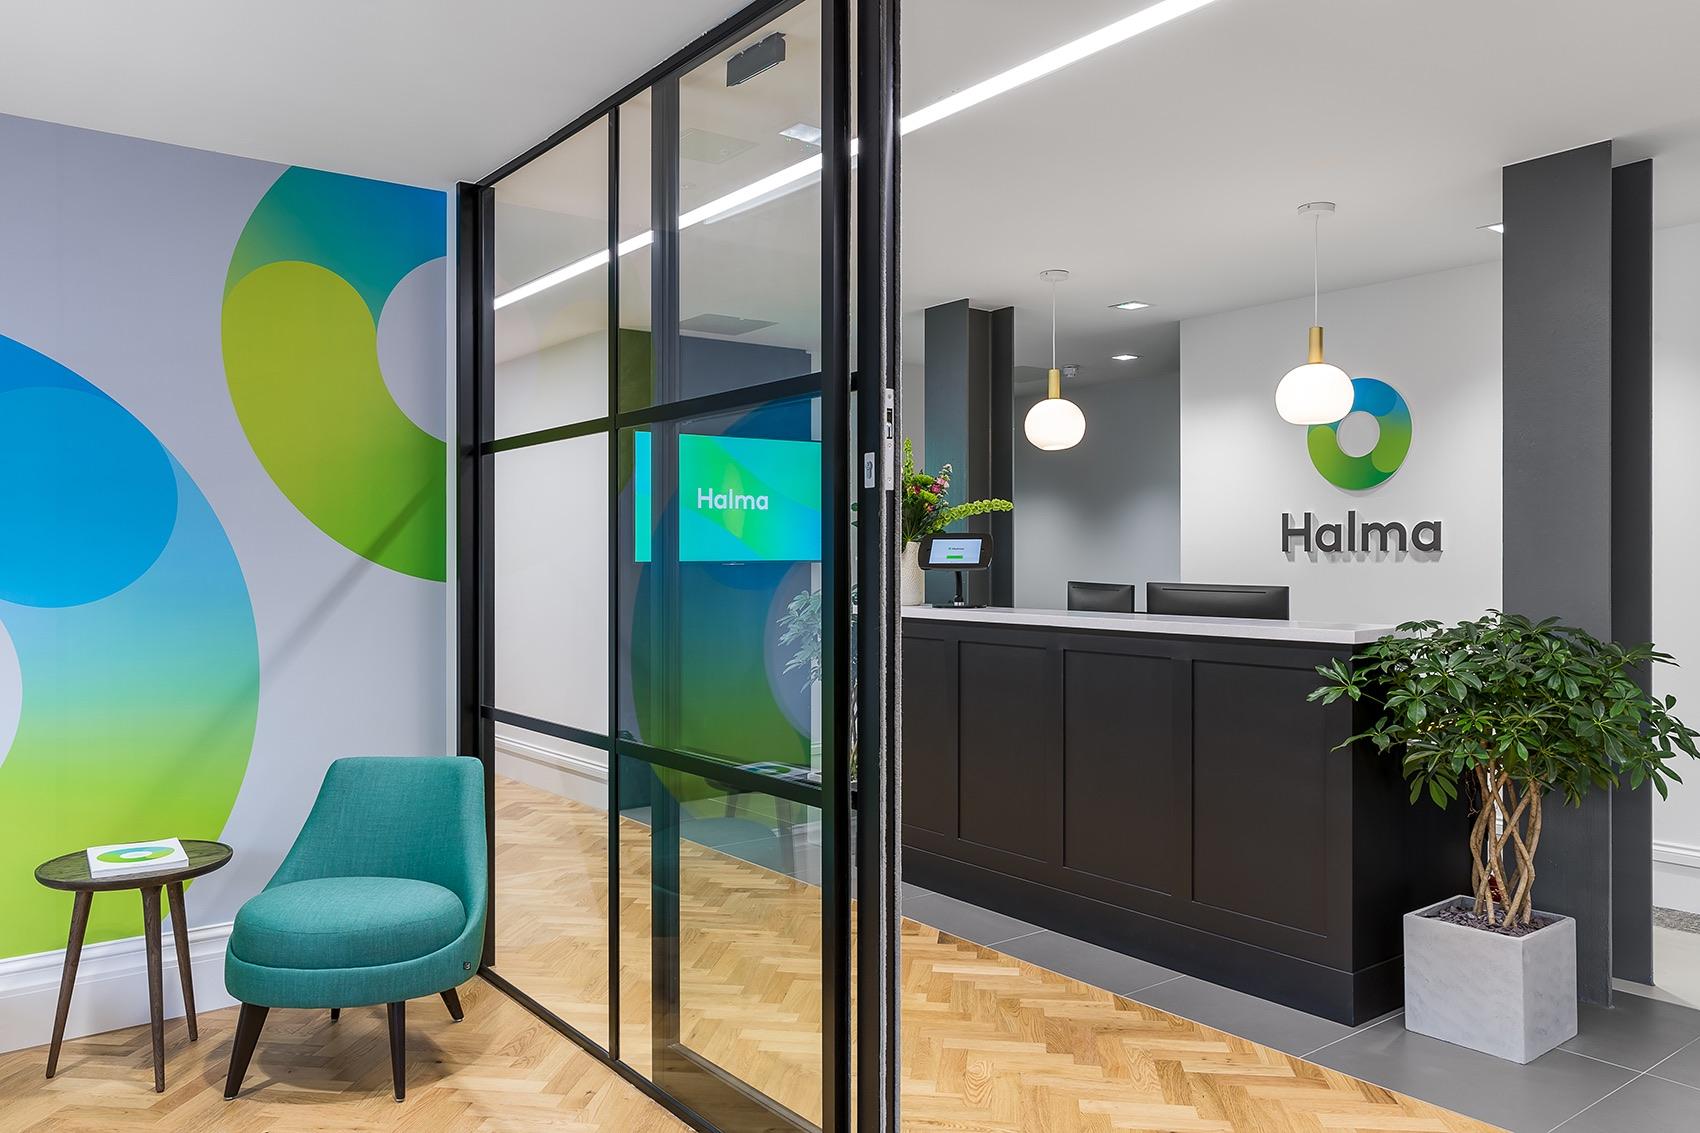 halma-amersham-office-7